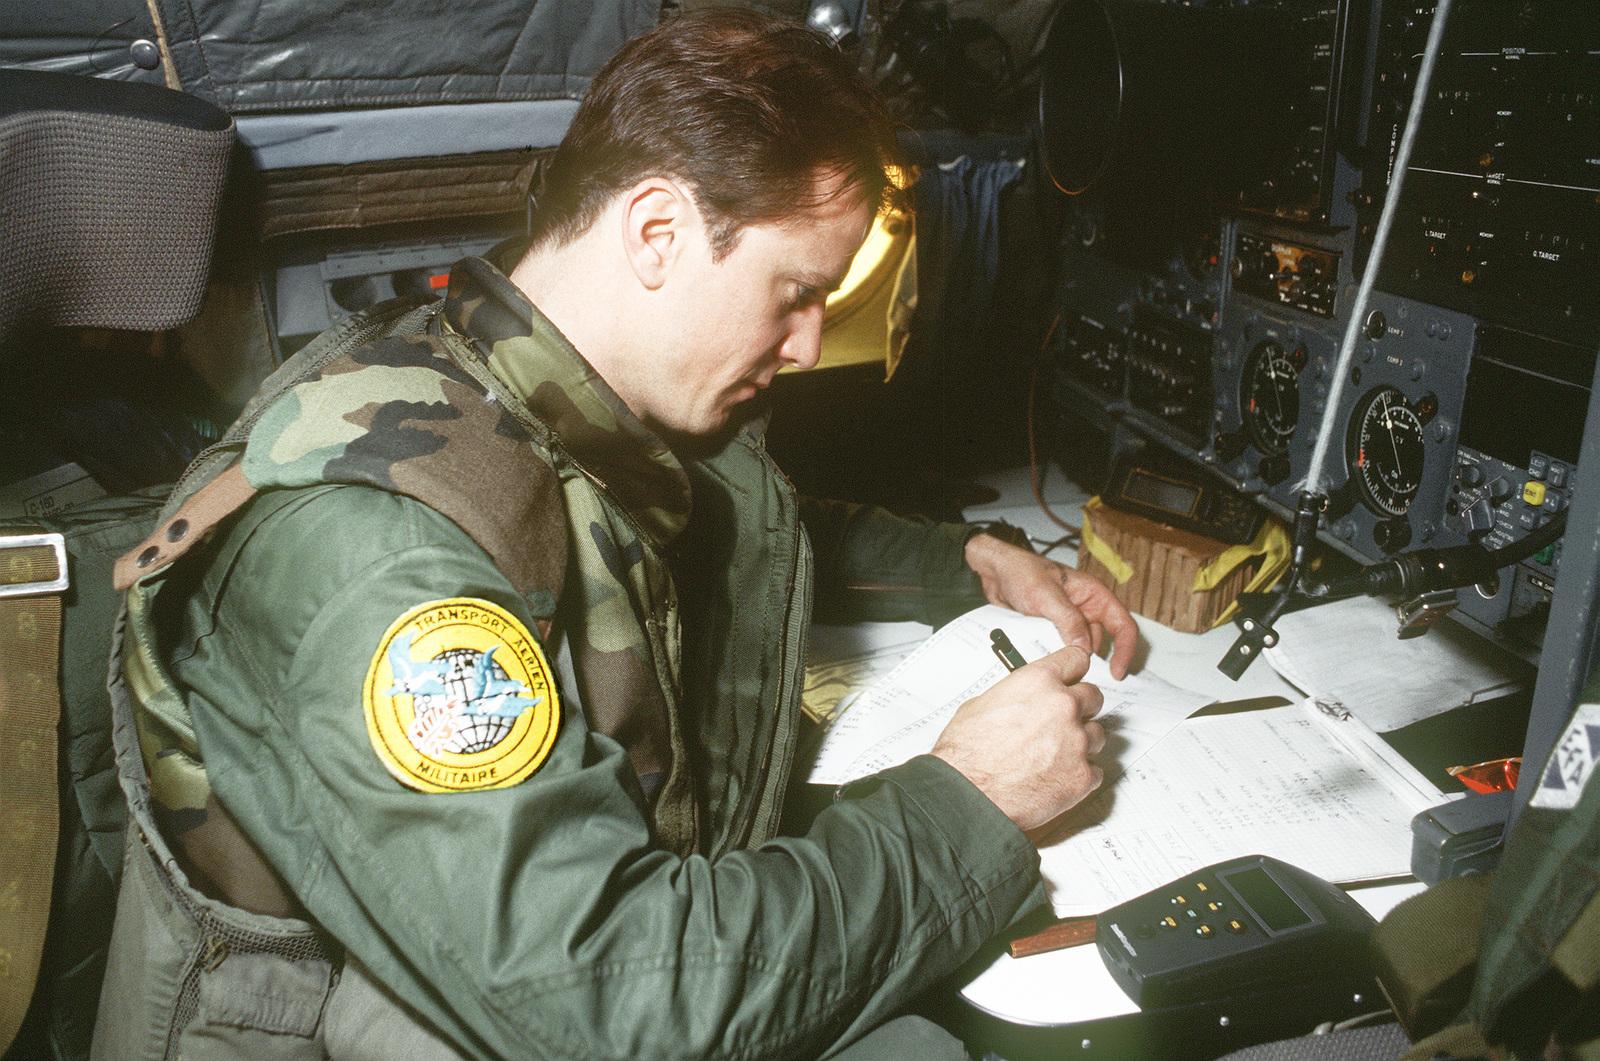 CPT Denis LeMeur, a French Air Force C-160 Transall navigator